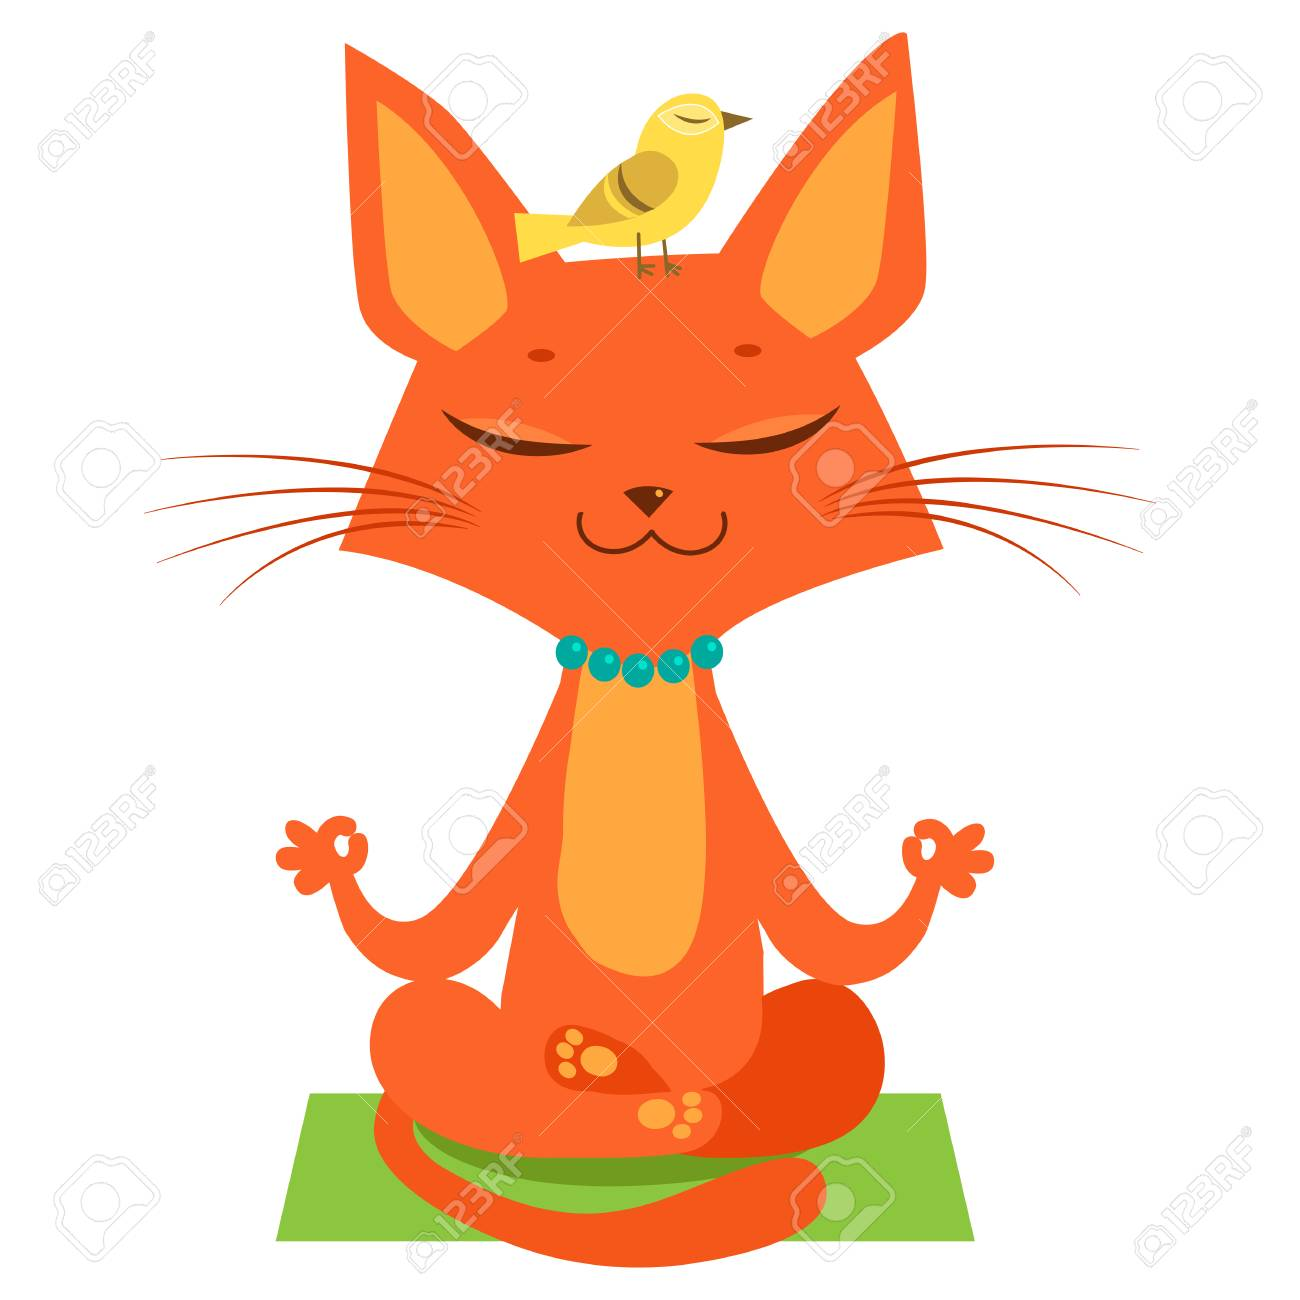 Meditating Yoga Cat Vector Funny Cartoon Cat Practicing Yoga Royalty Free Cliparts Vectors And Stock Illustration Image 84813310